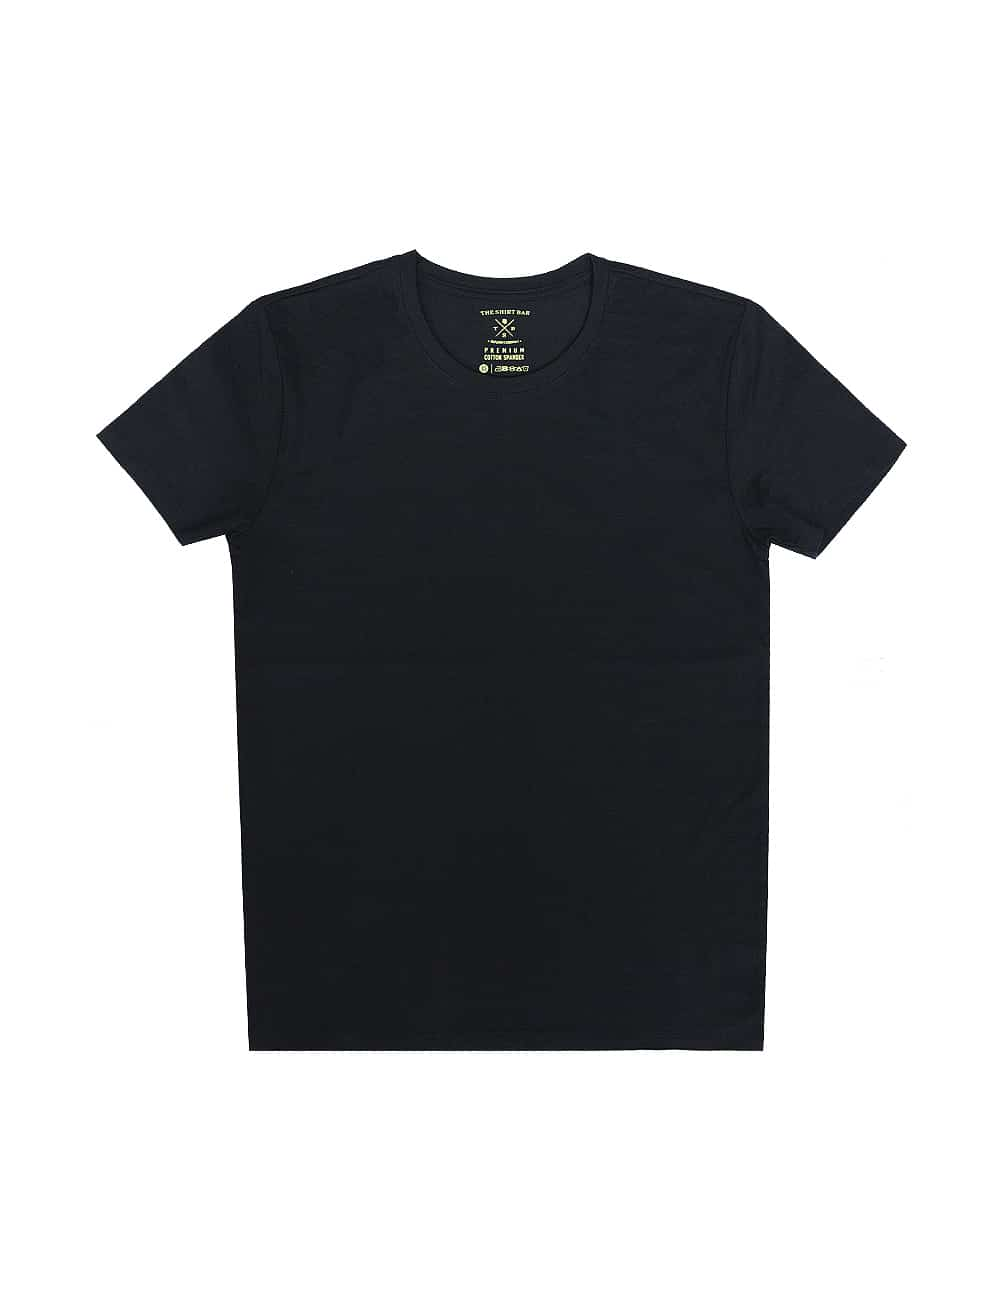 Slim Fit Black Premium Cotton Stretch Short Sleeves Crew Neck T-shirt TS1A2.1